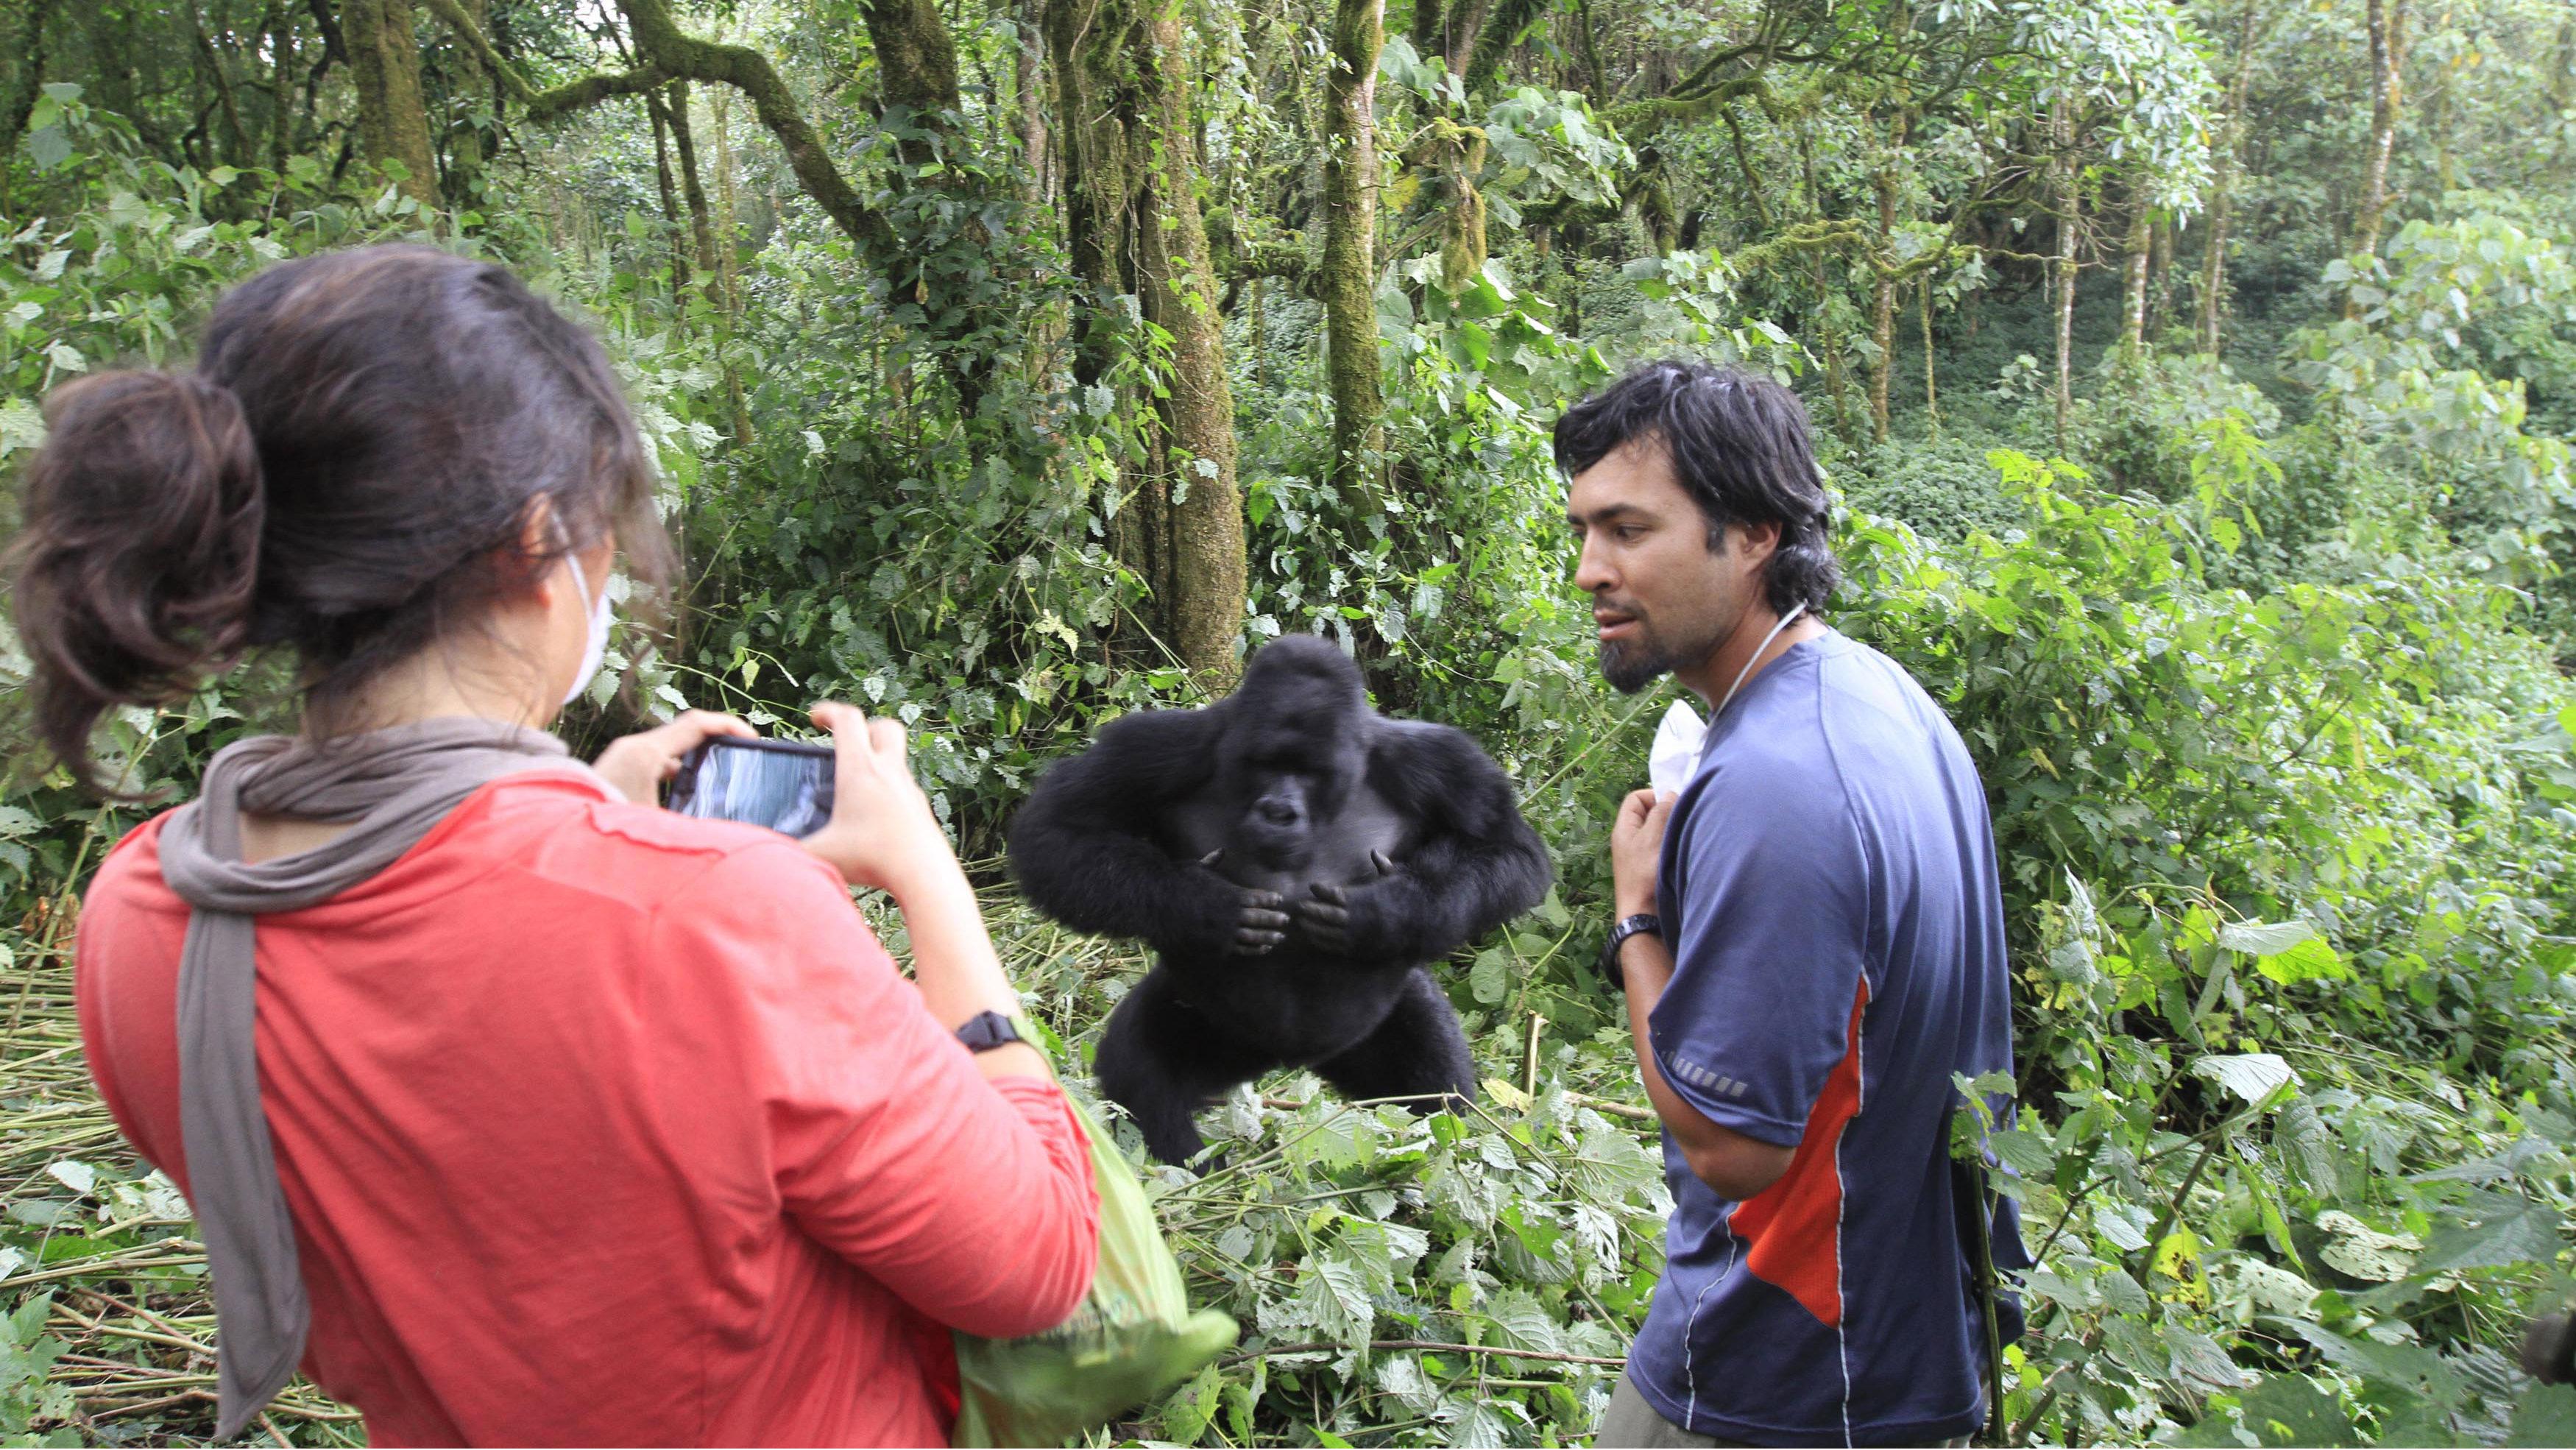 tourist in virunga park with gorilla